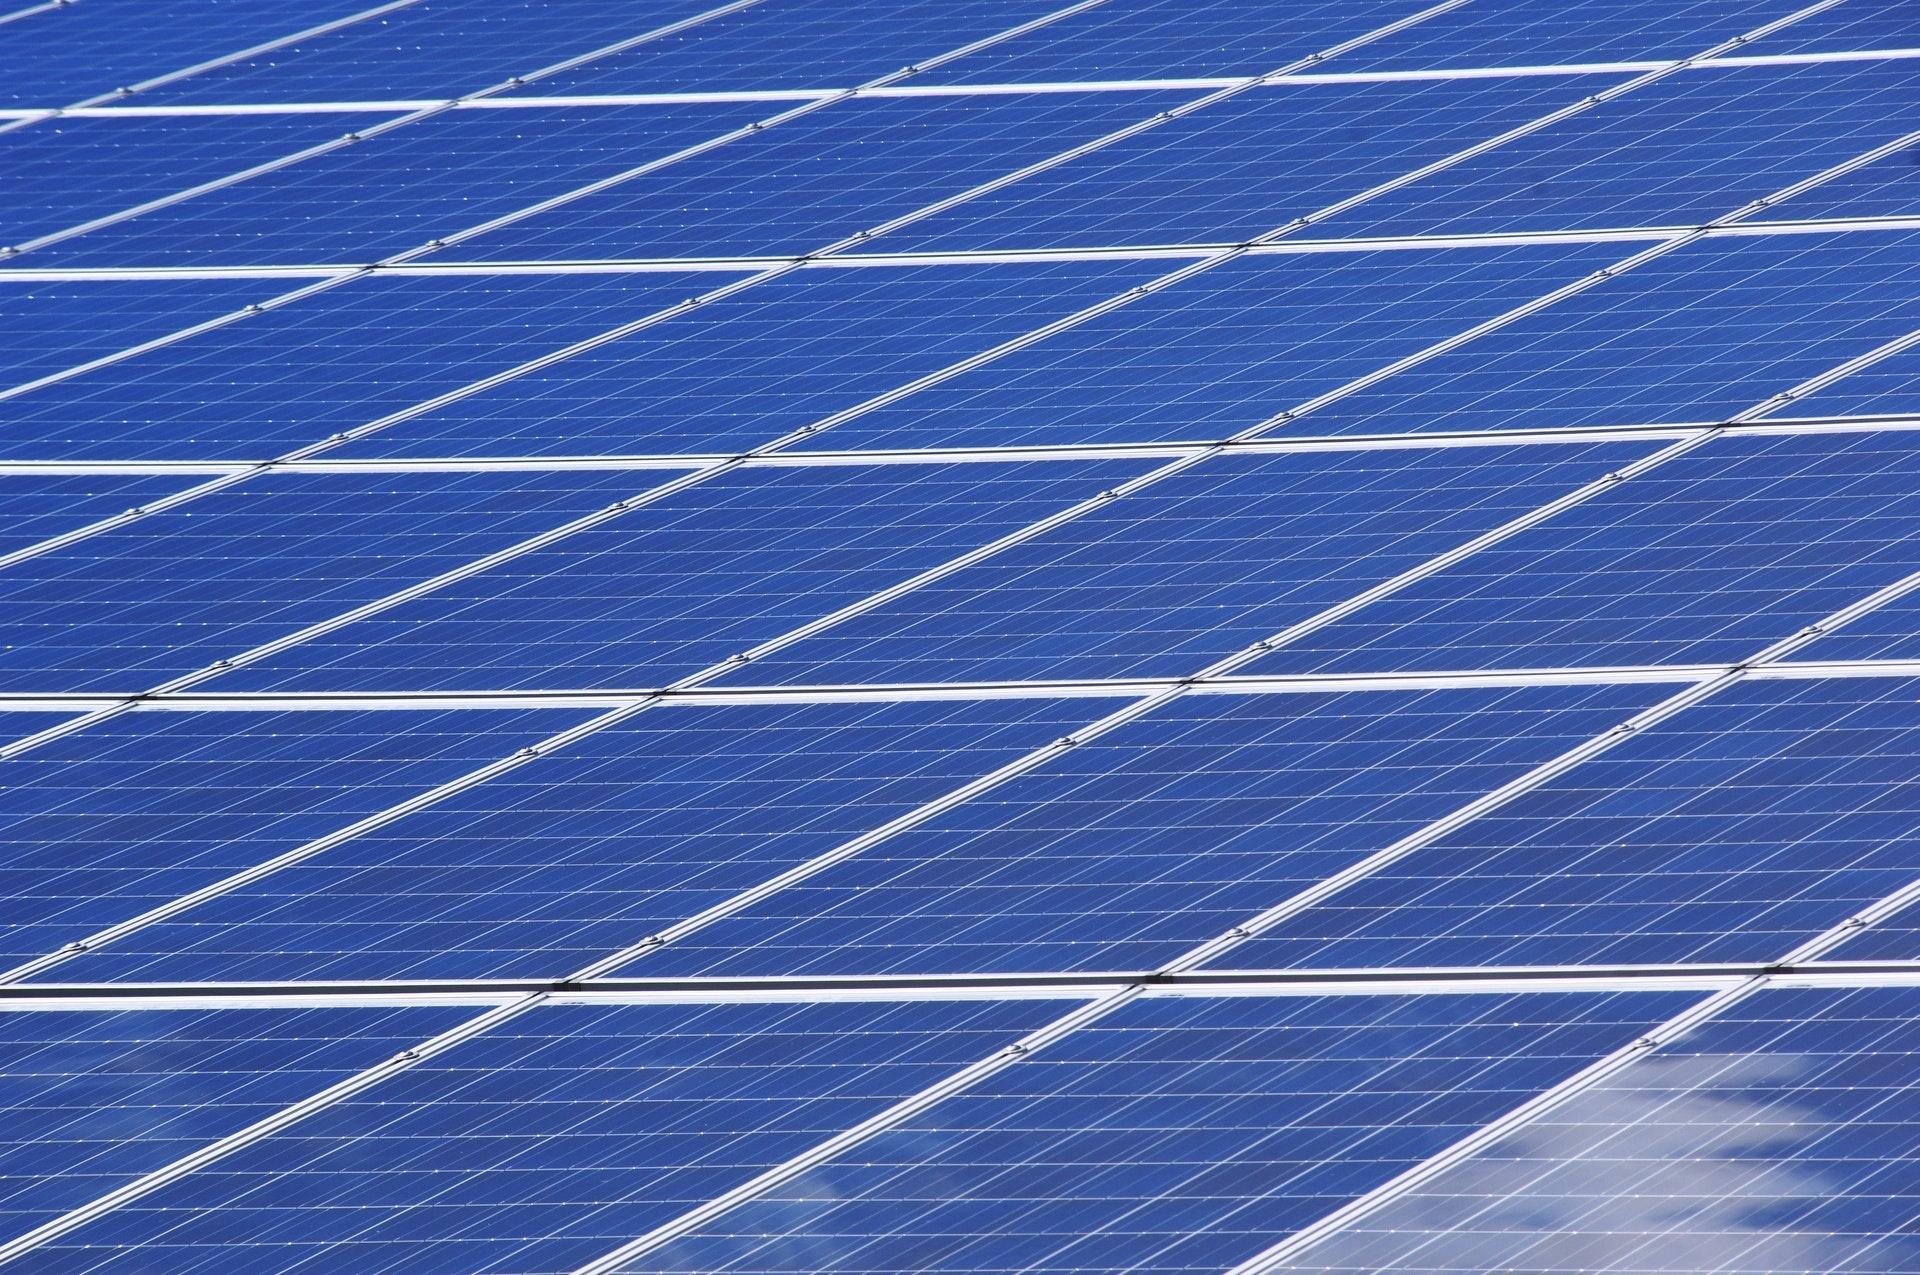 Solar PV, Solar, Solar Power, Solar Energy, YSG Solar